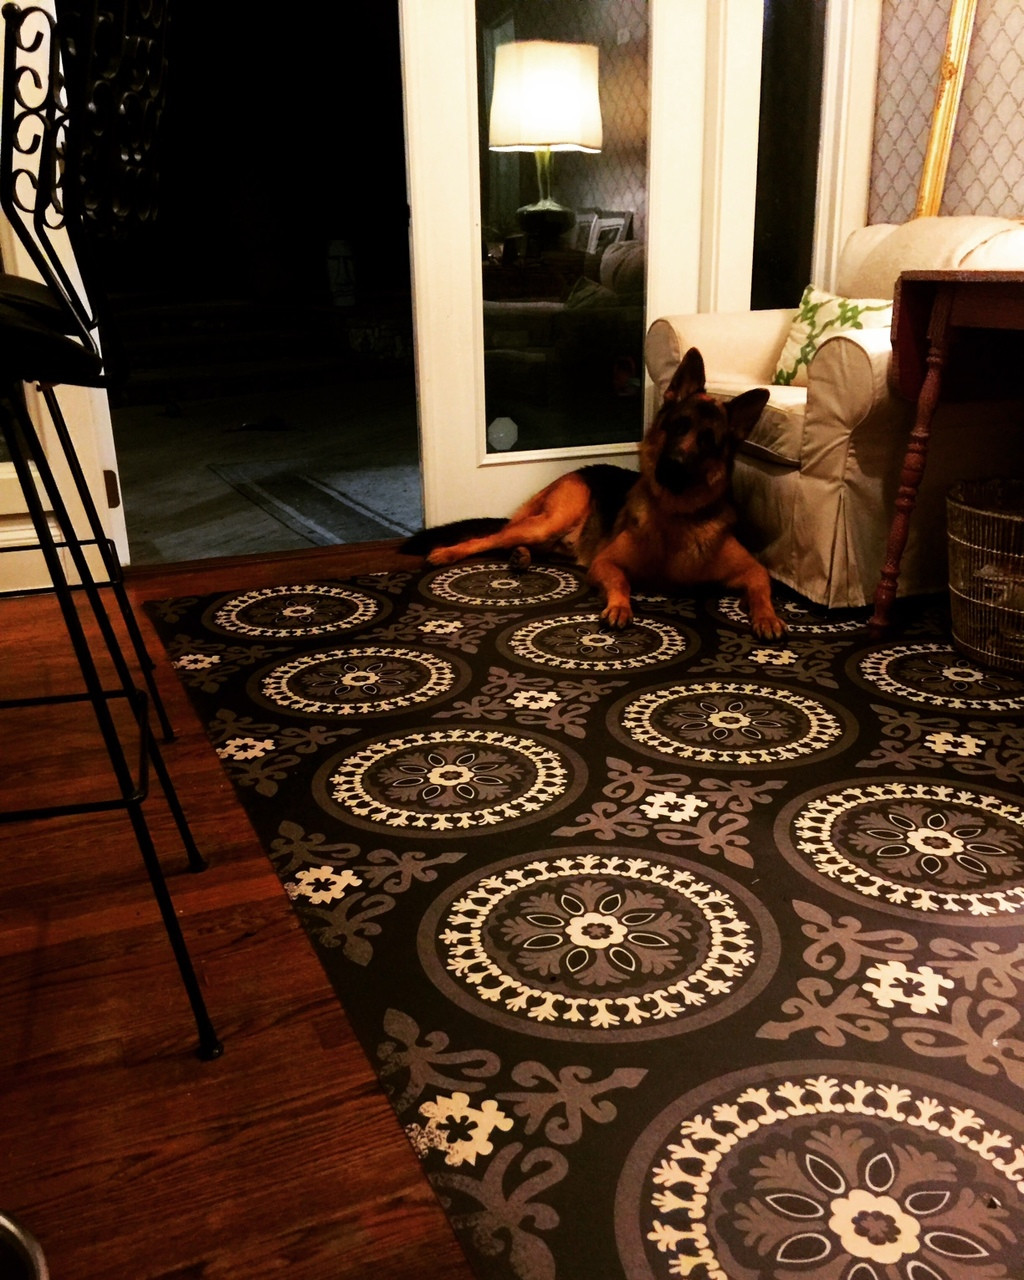 Customer in home use of Karma